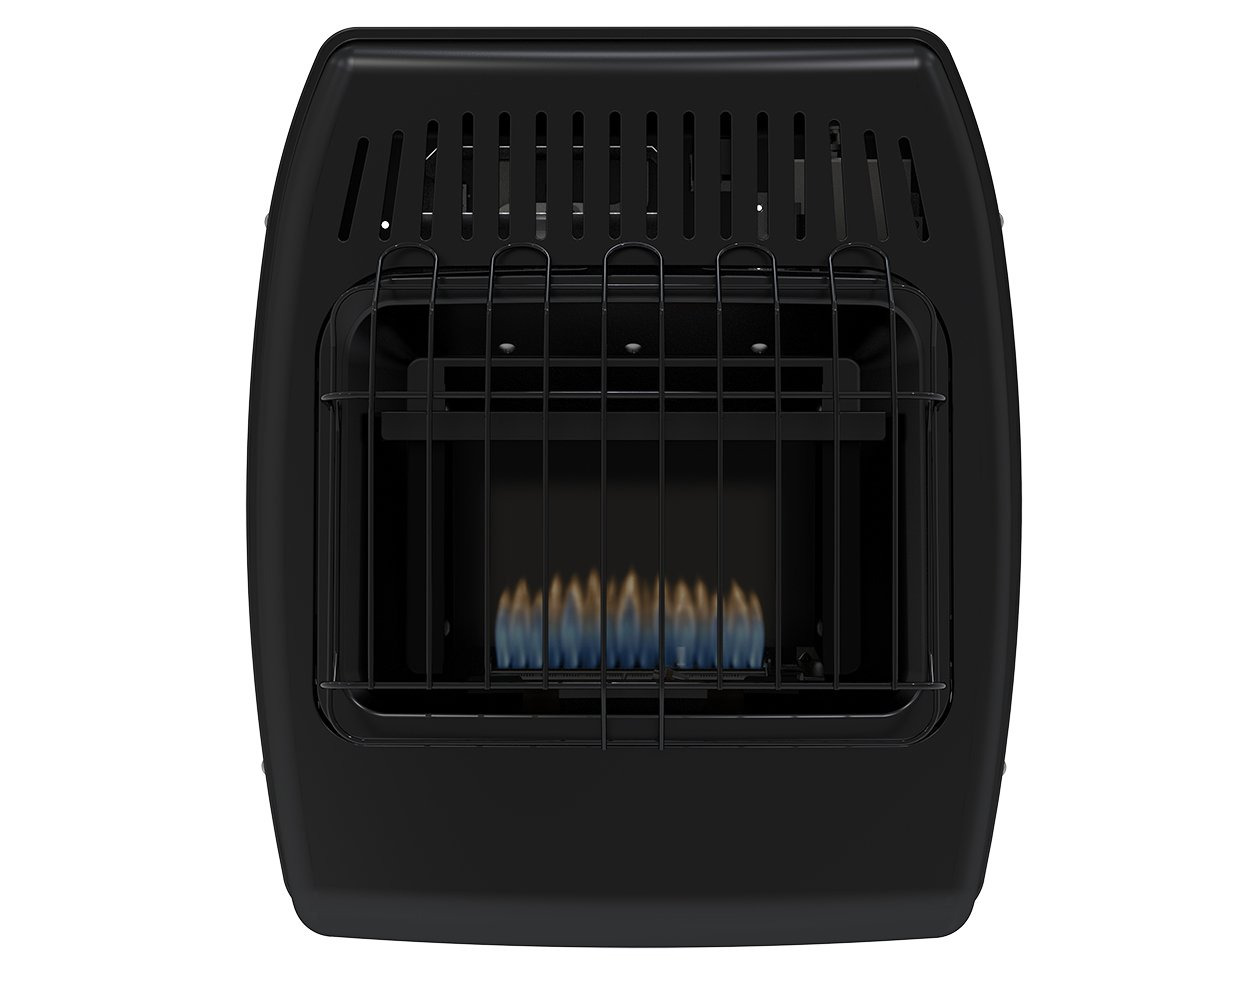 Dyna-Glo IBF10PMDG 10,000 BTU Liquid Propane Blue Flame Vent Free Ice House Heater by Dyna-Glo